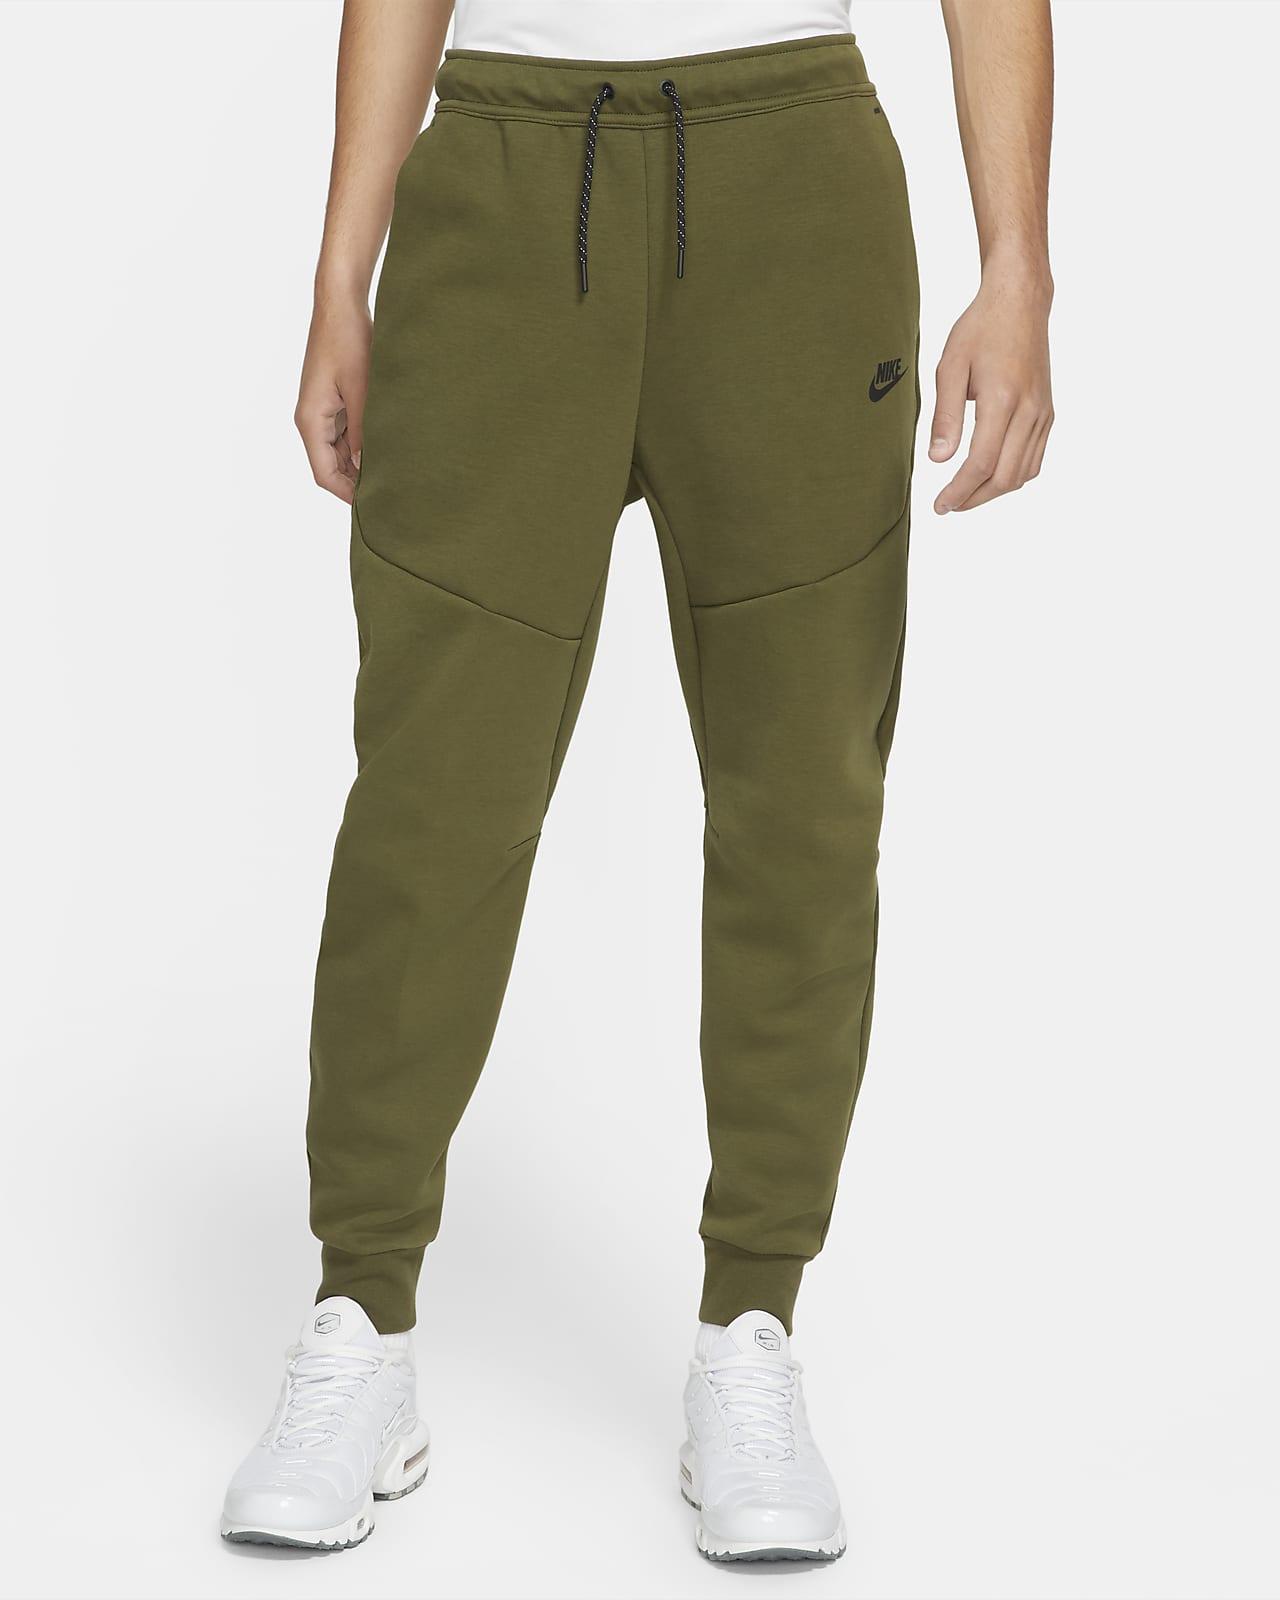 Мужские джоггеры Nike Sportswear Tech Fleece